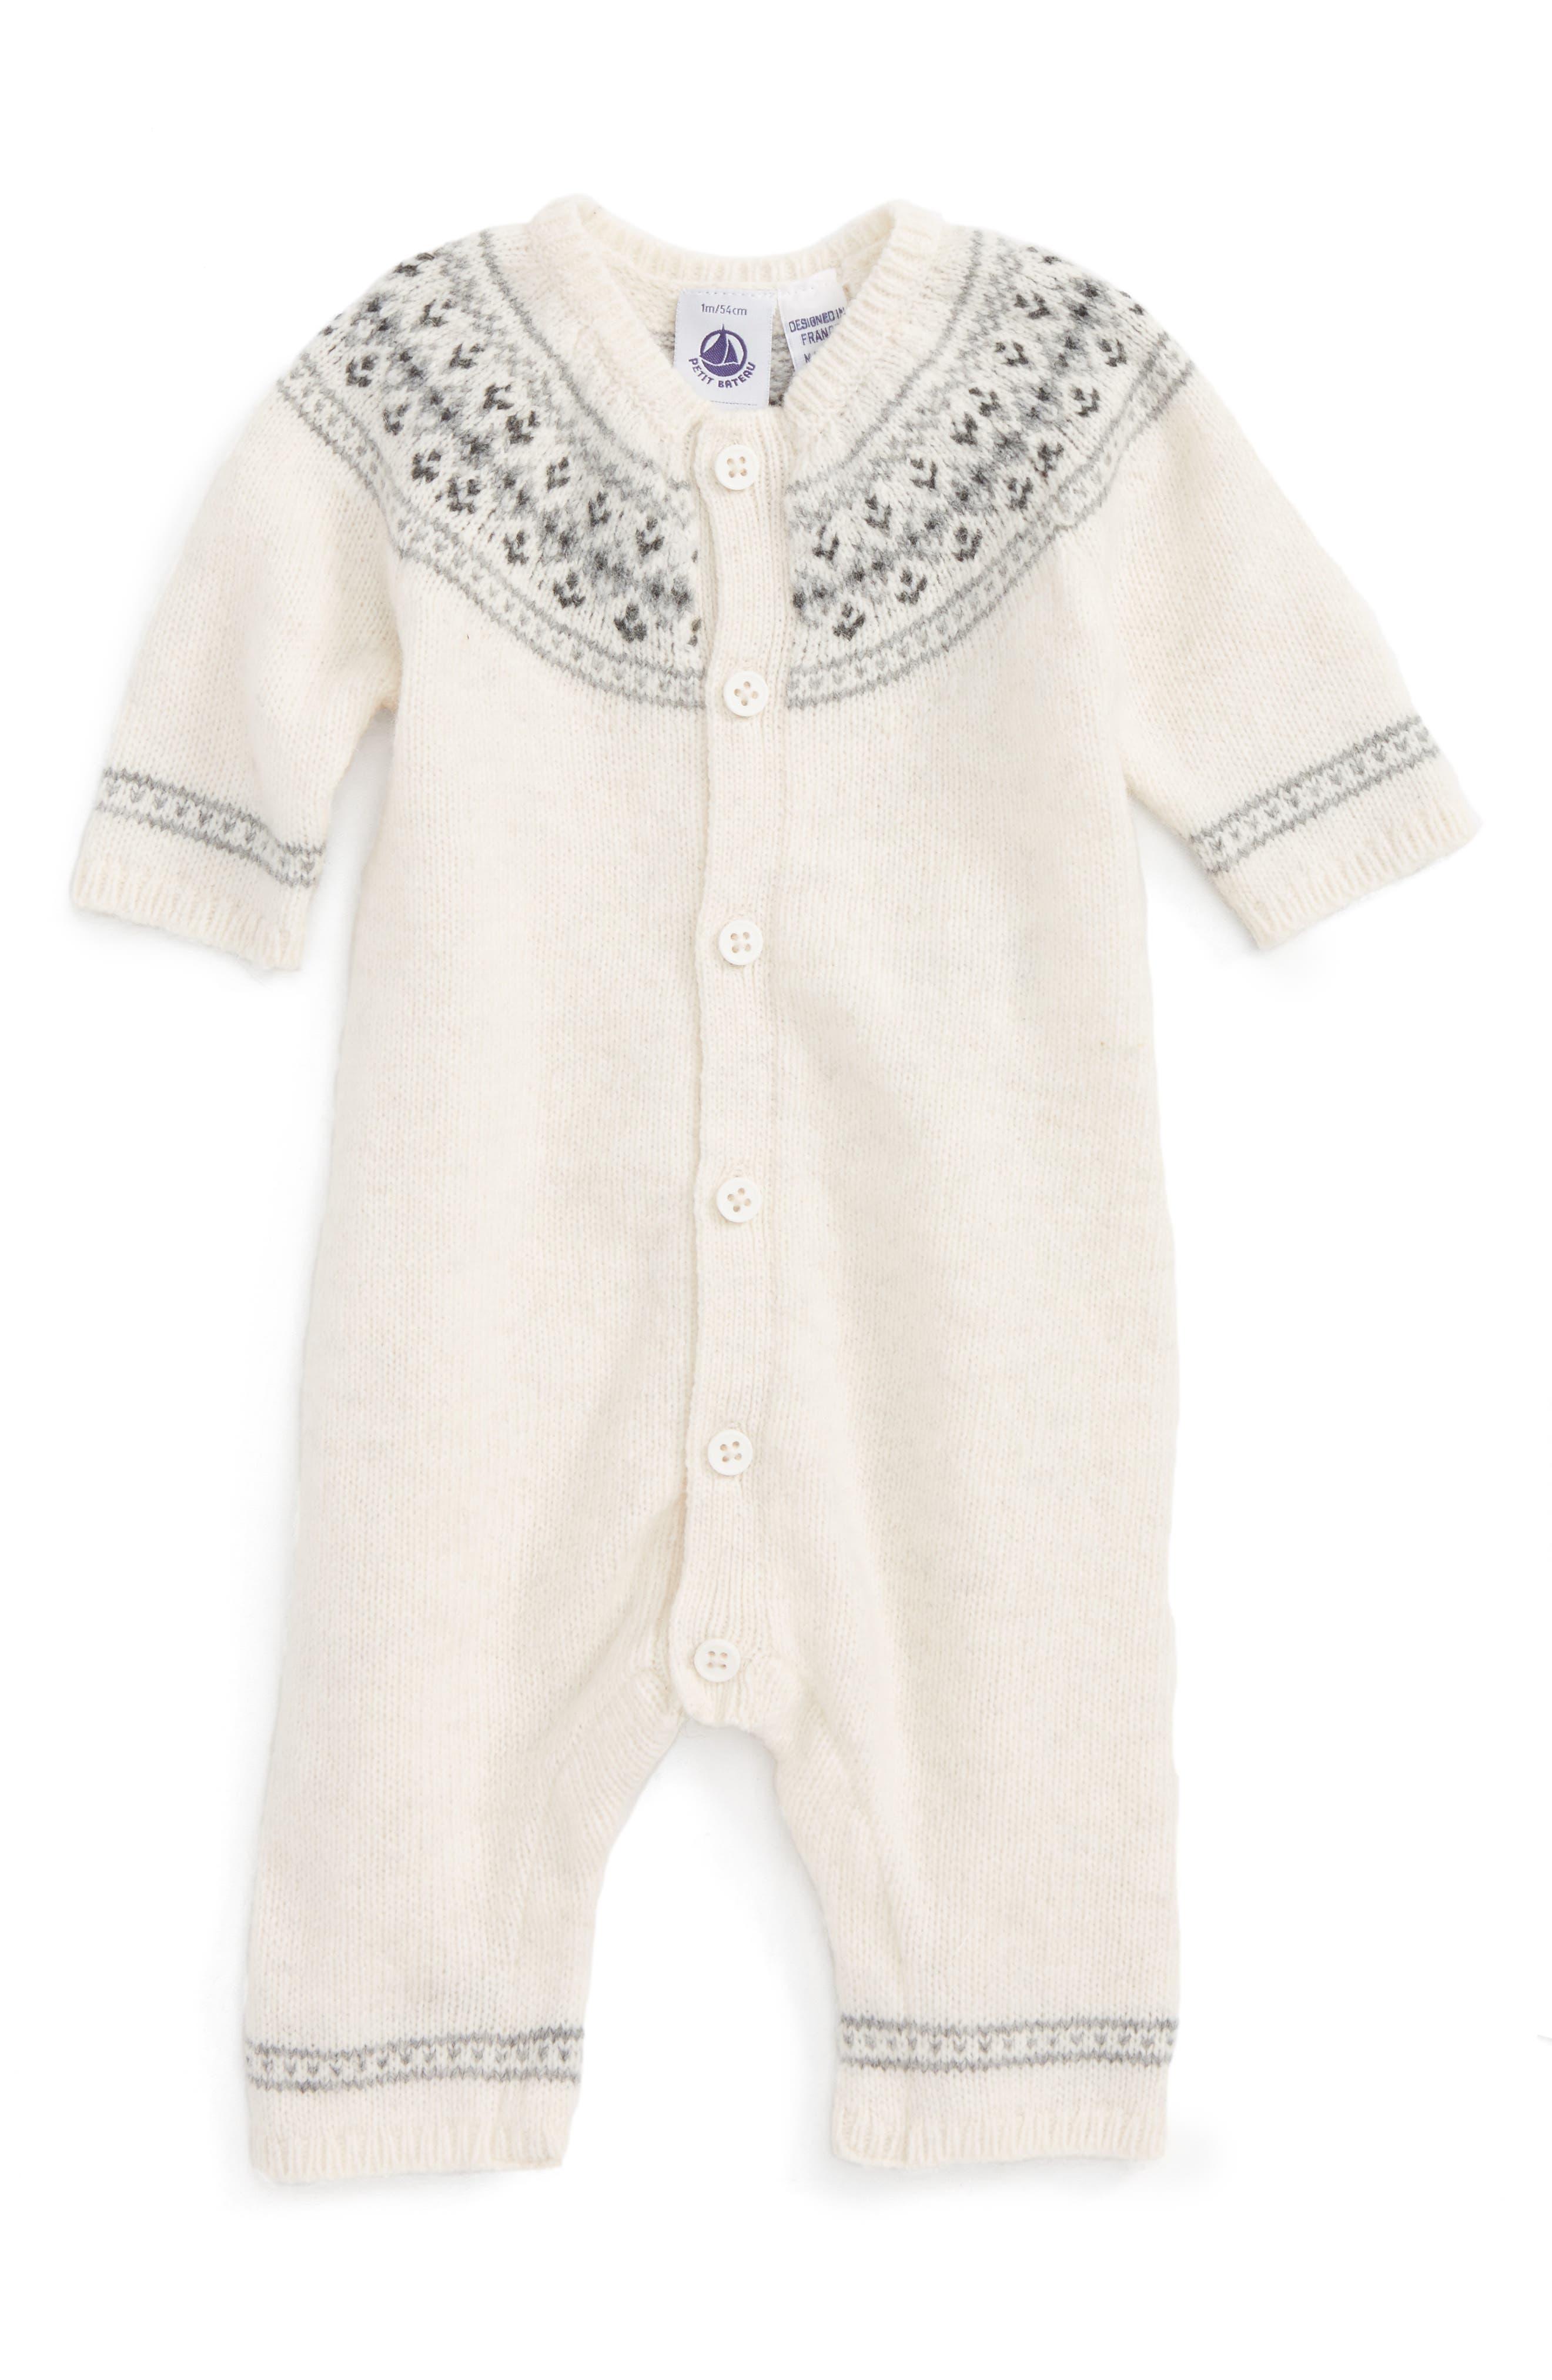 Main Image - Petit Bateau Knit Romper (Baby)